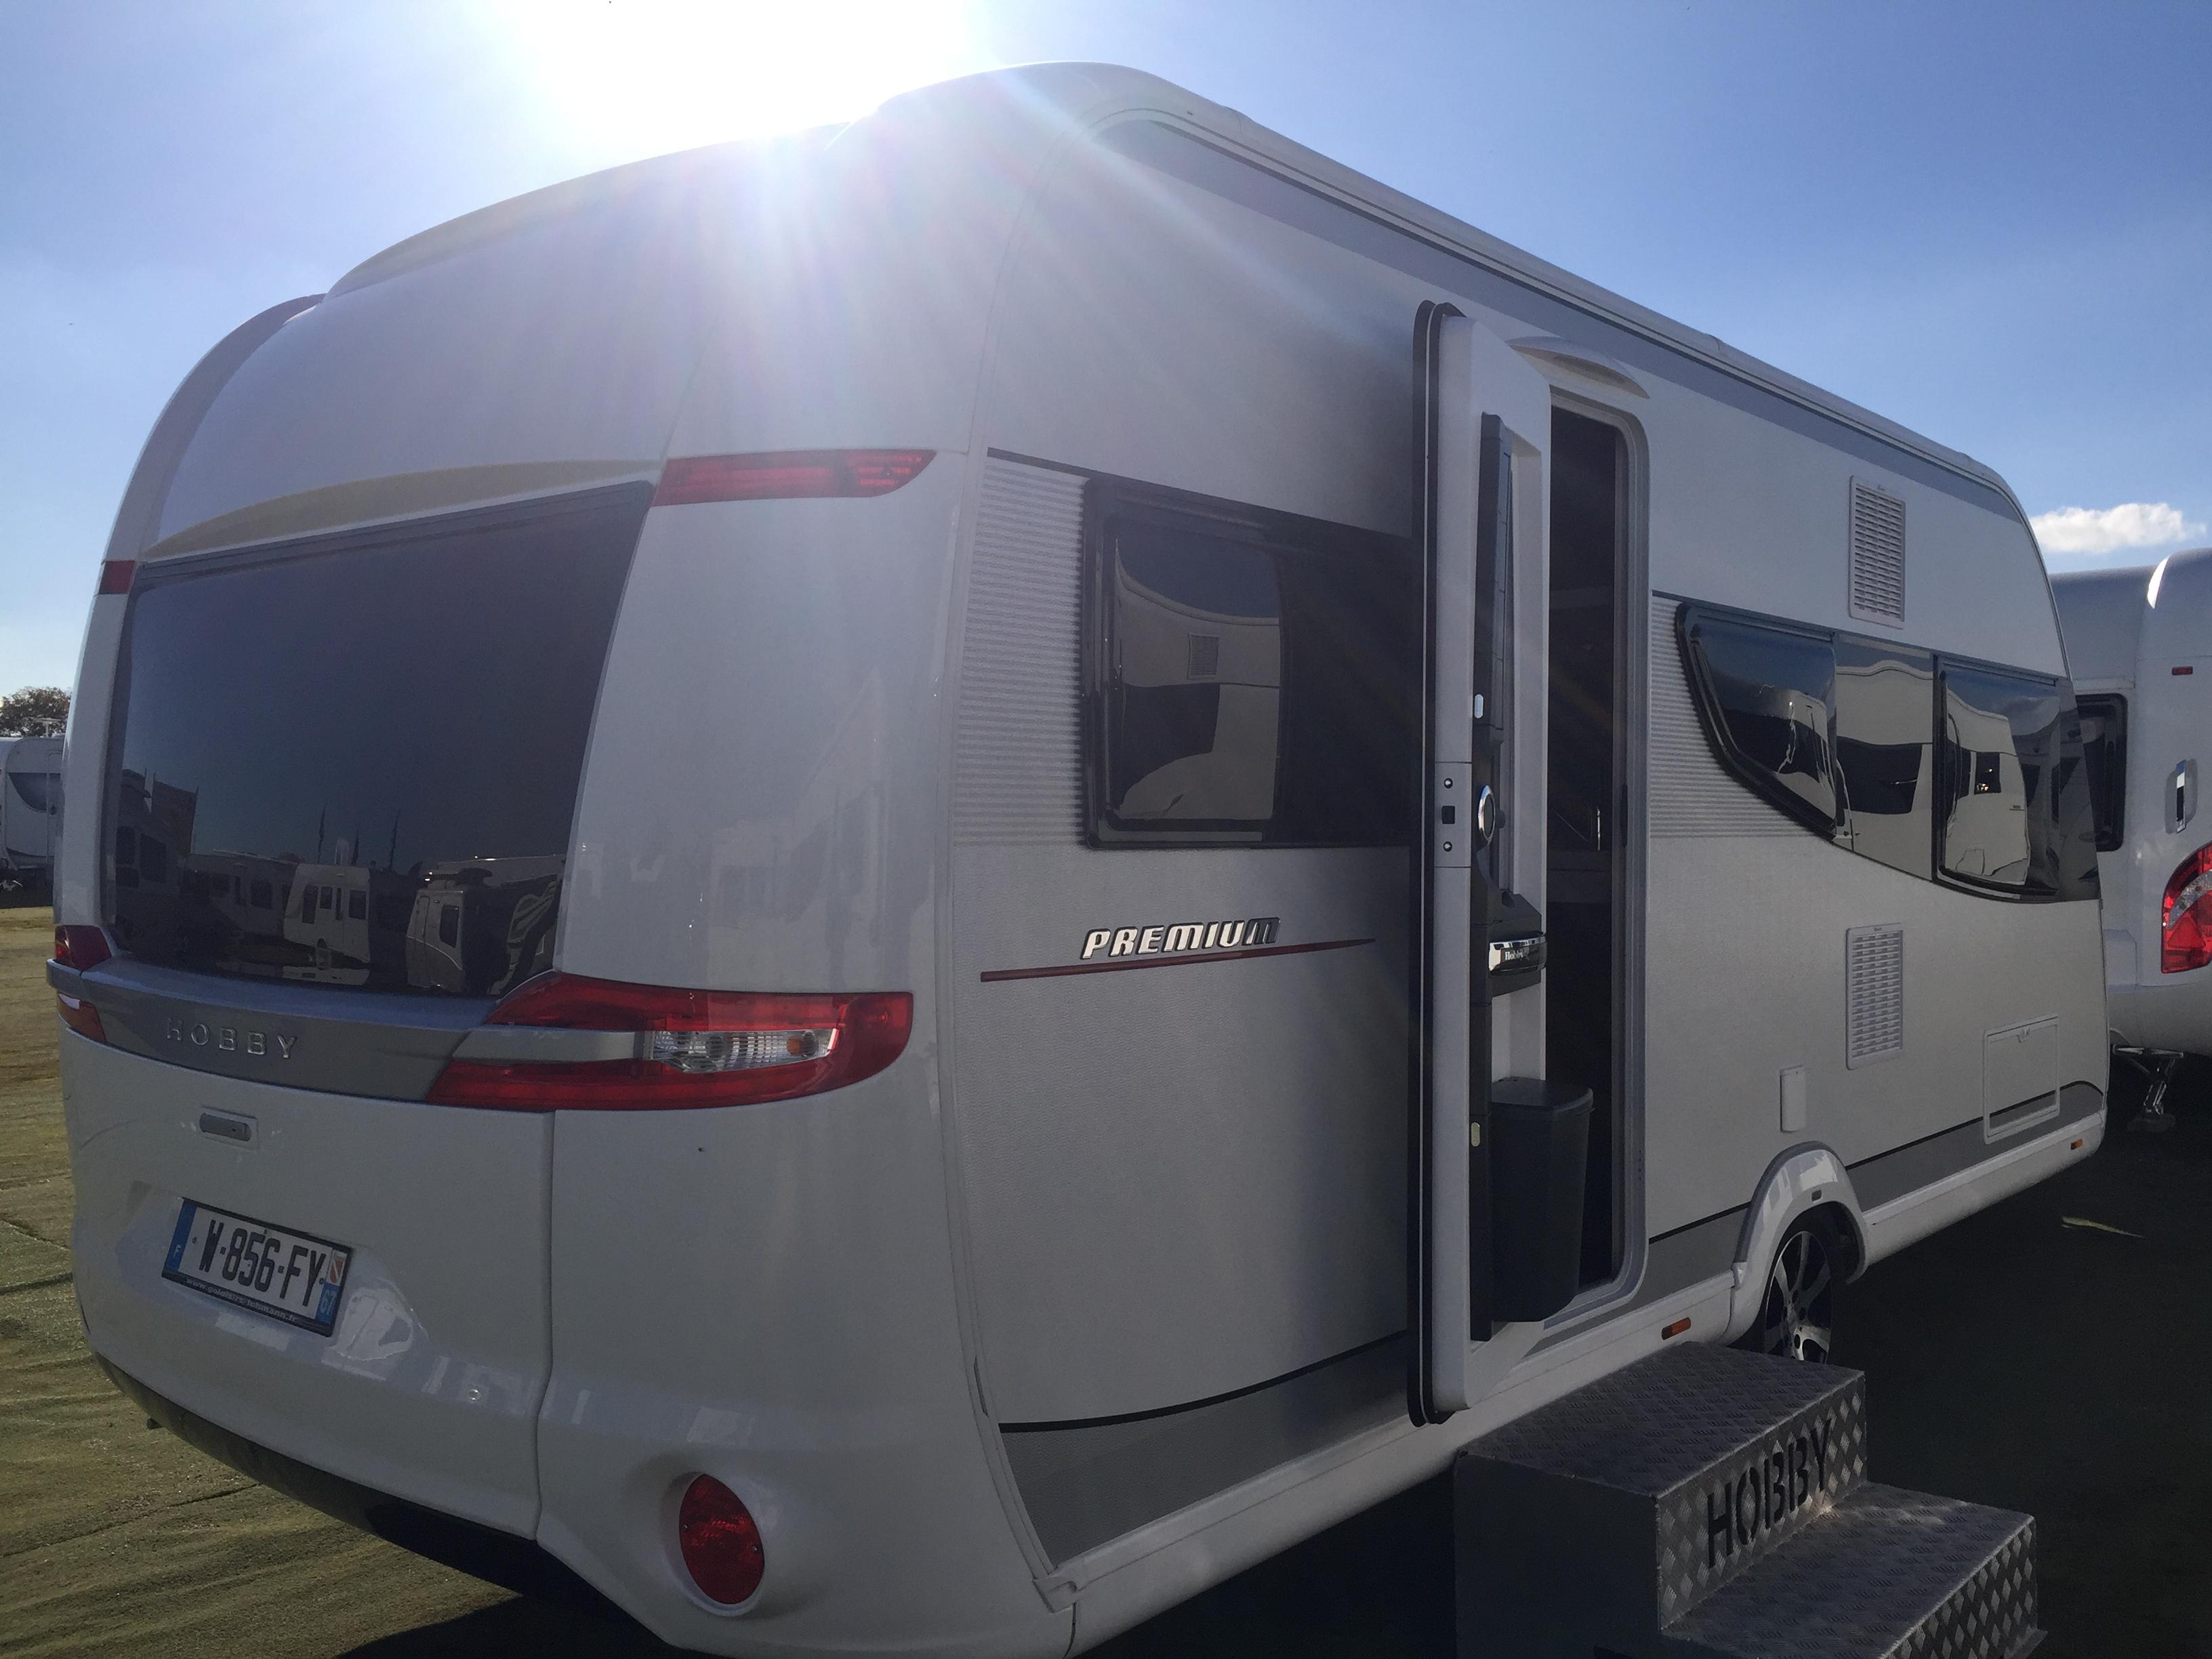 hobby 495 ul premium neuf de 2018 caravane en vente oberschaeffolsheim rhin 67. Black Bedroom Furniture Sets. Home Design Ideas